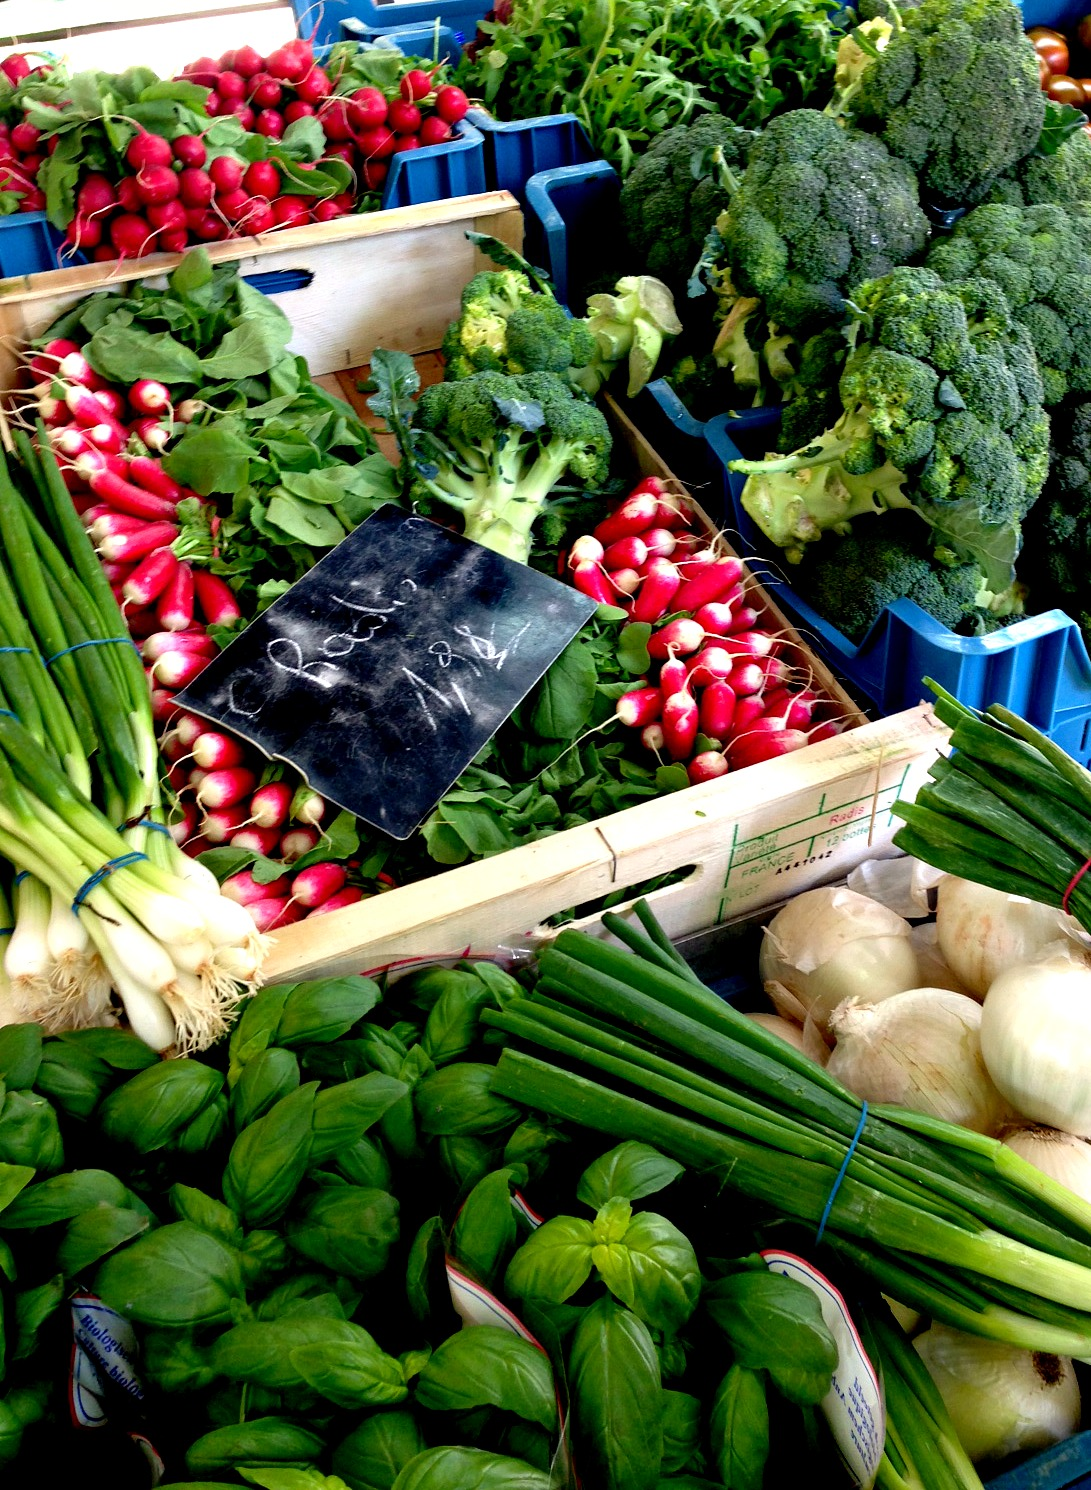 Belgium Farmers Market Greens and Radishes